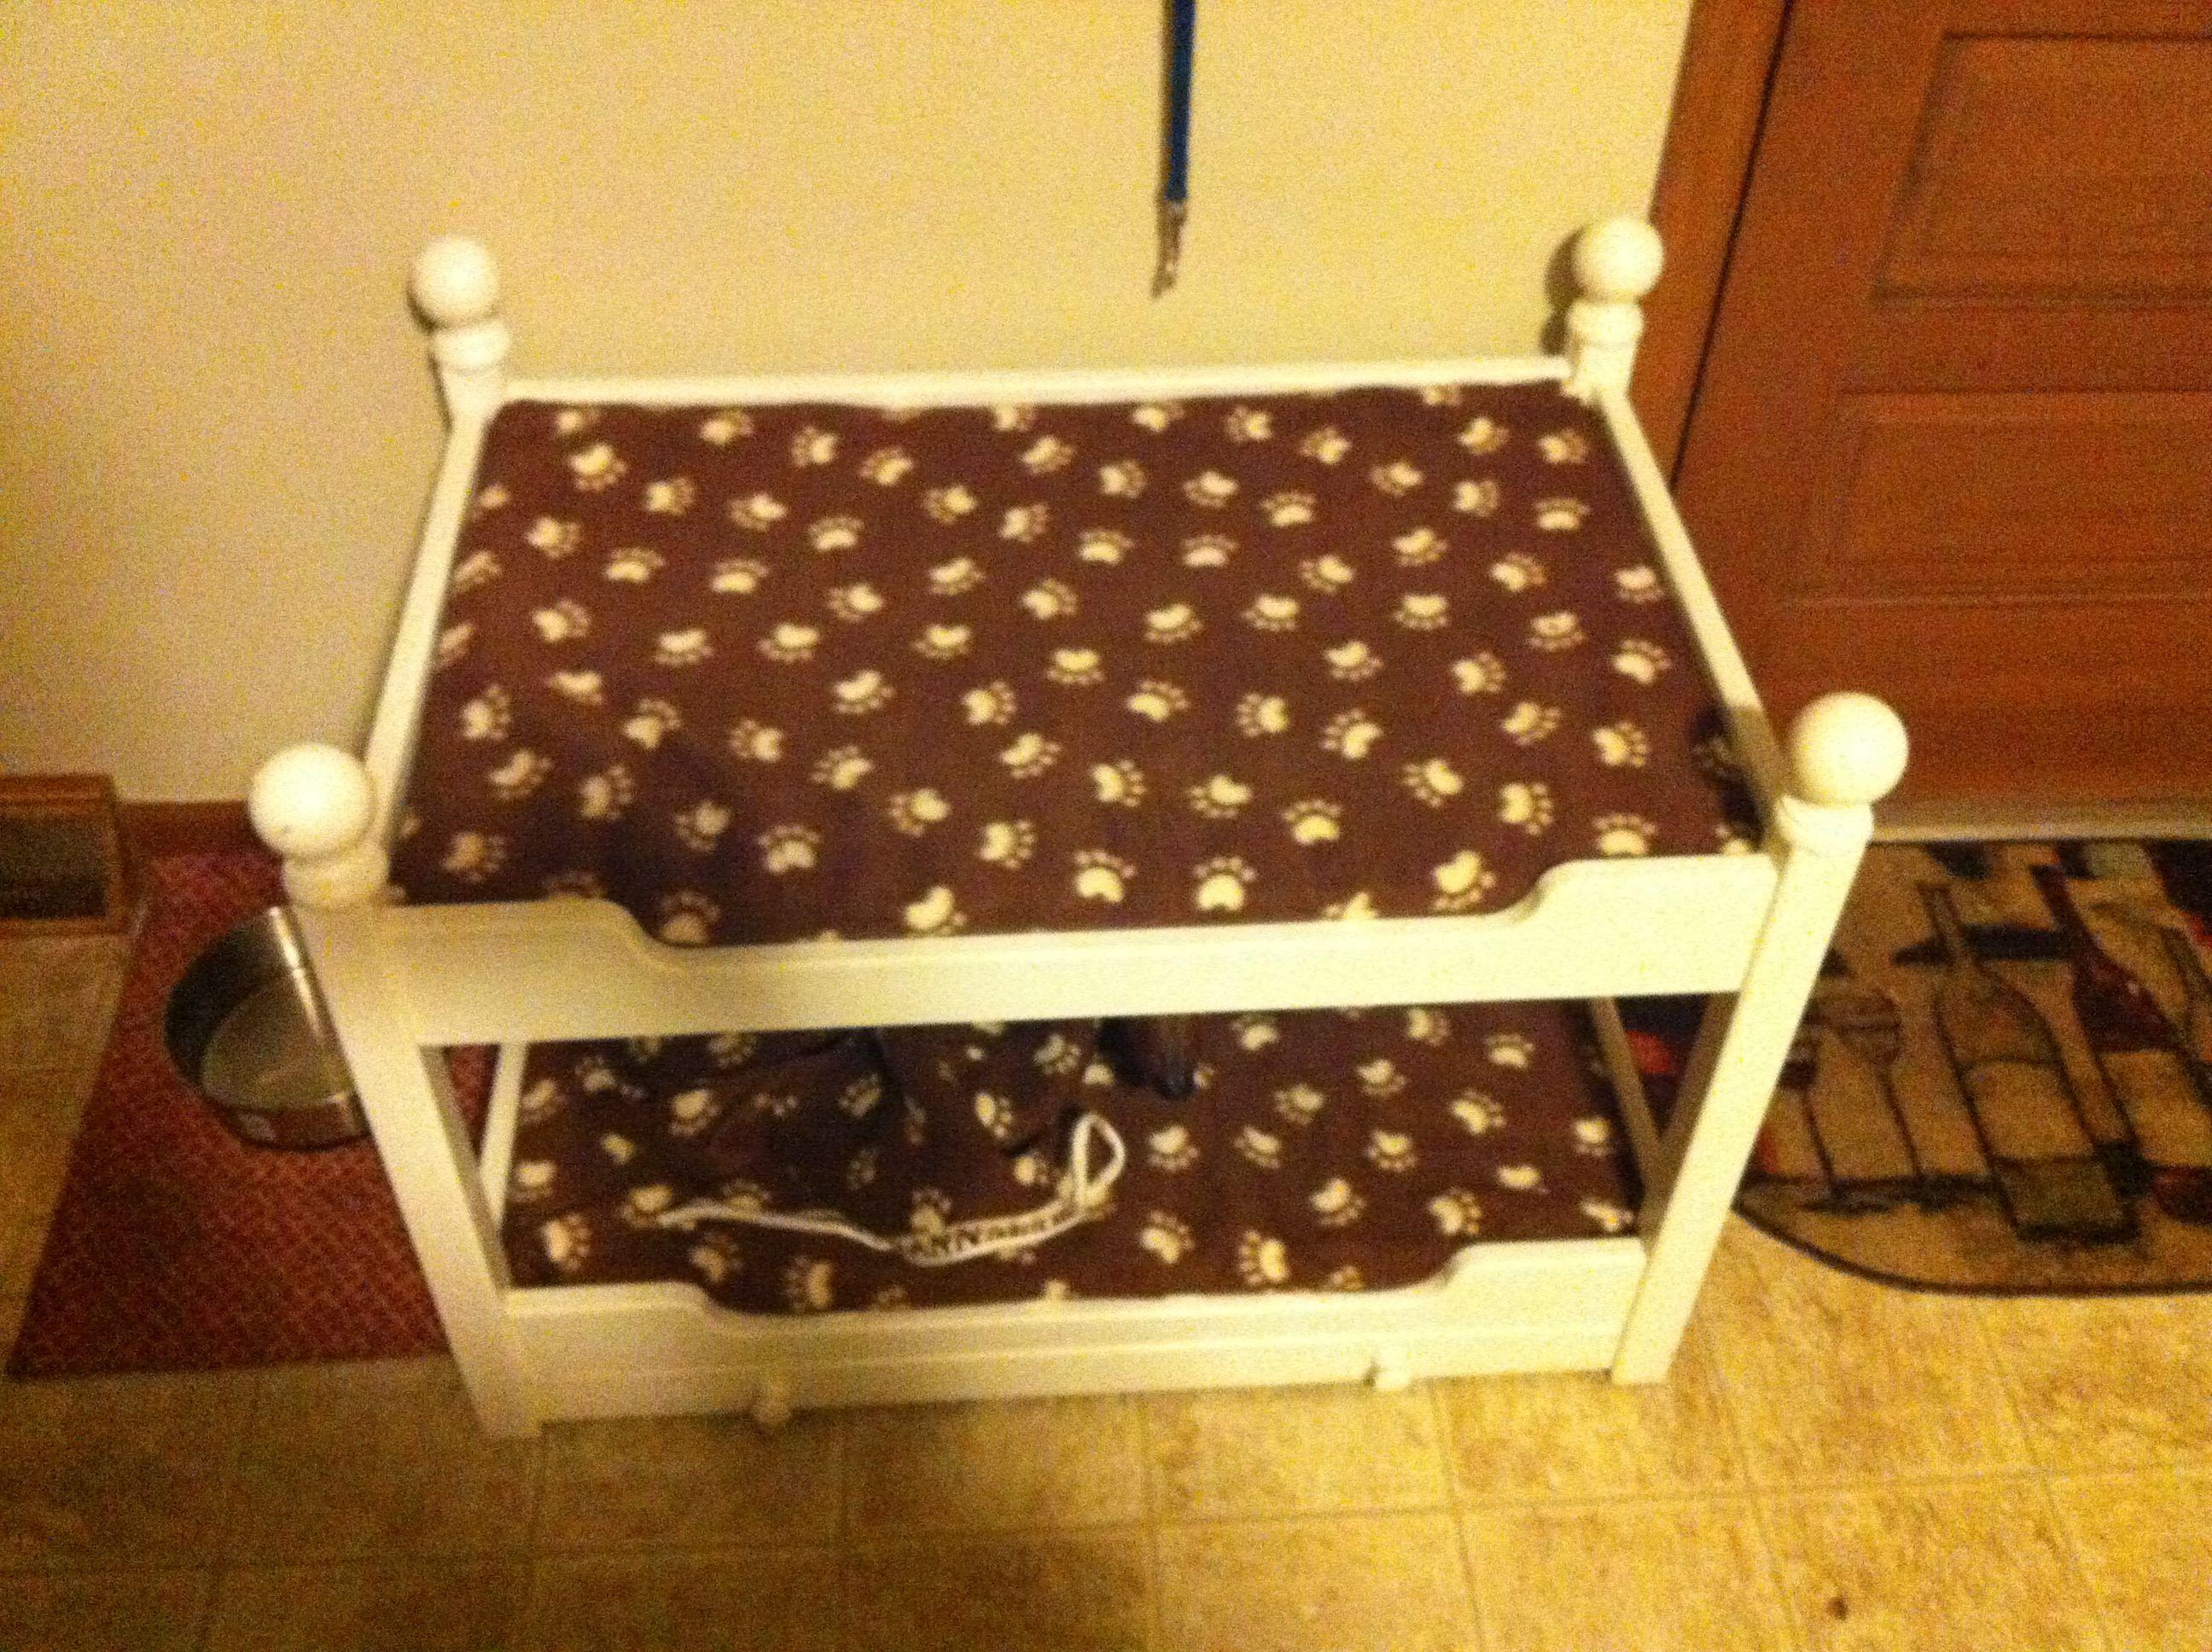 Dog Bunk Beds With Bowl Drawer Animals Pinterest Dog Beds Dog